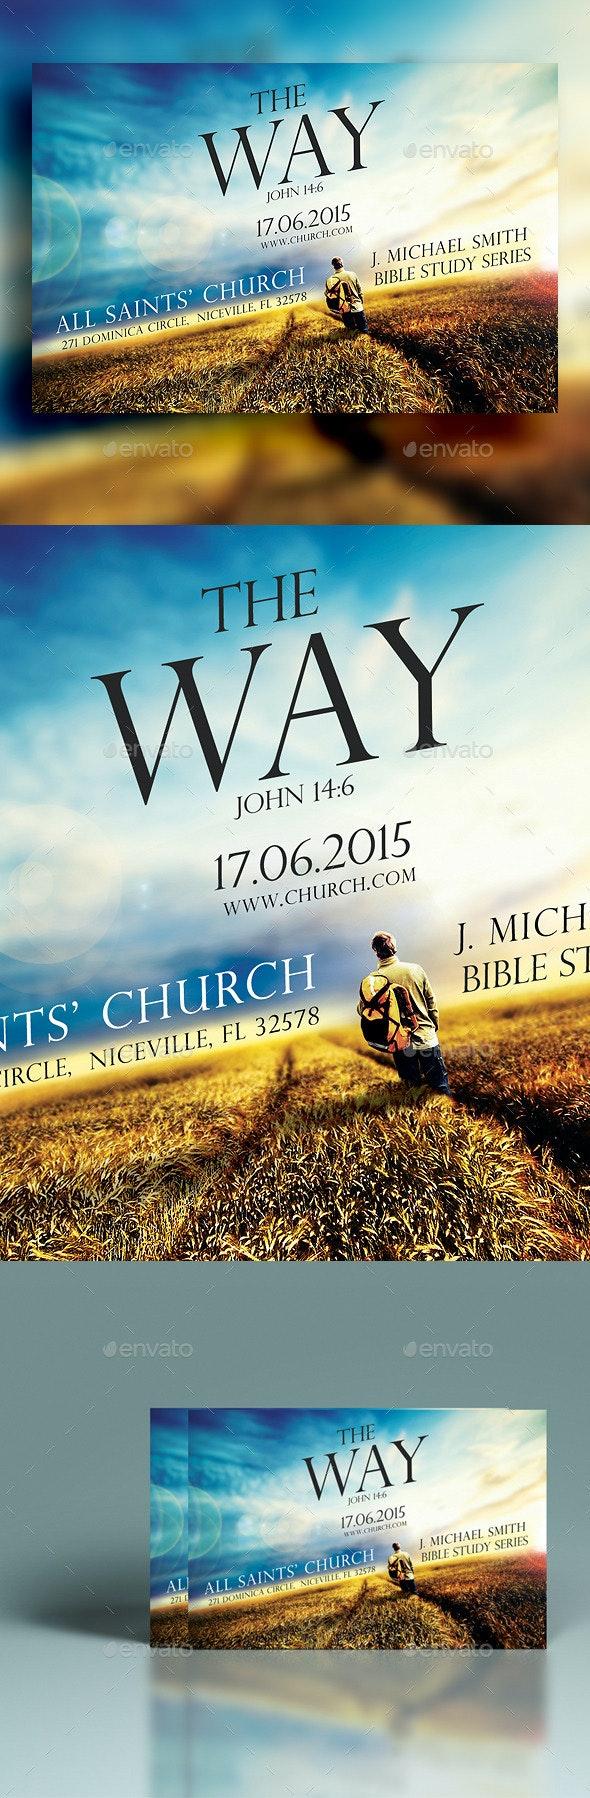 The Way Church Flyer - Church Flyers